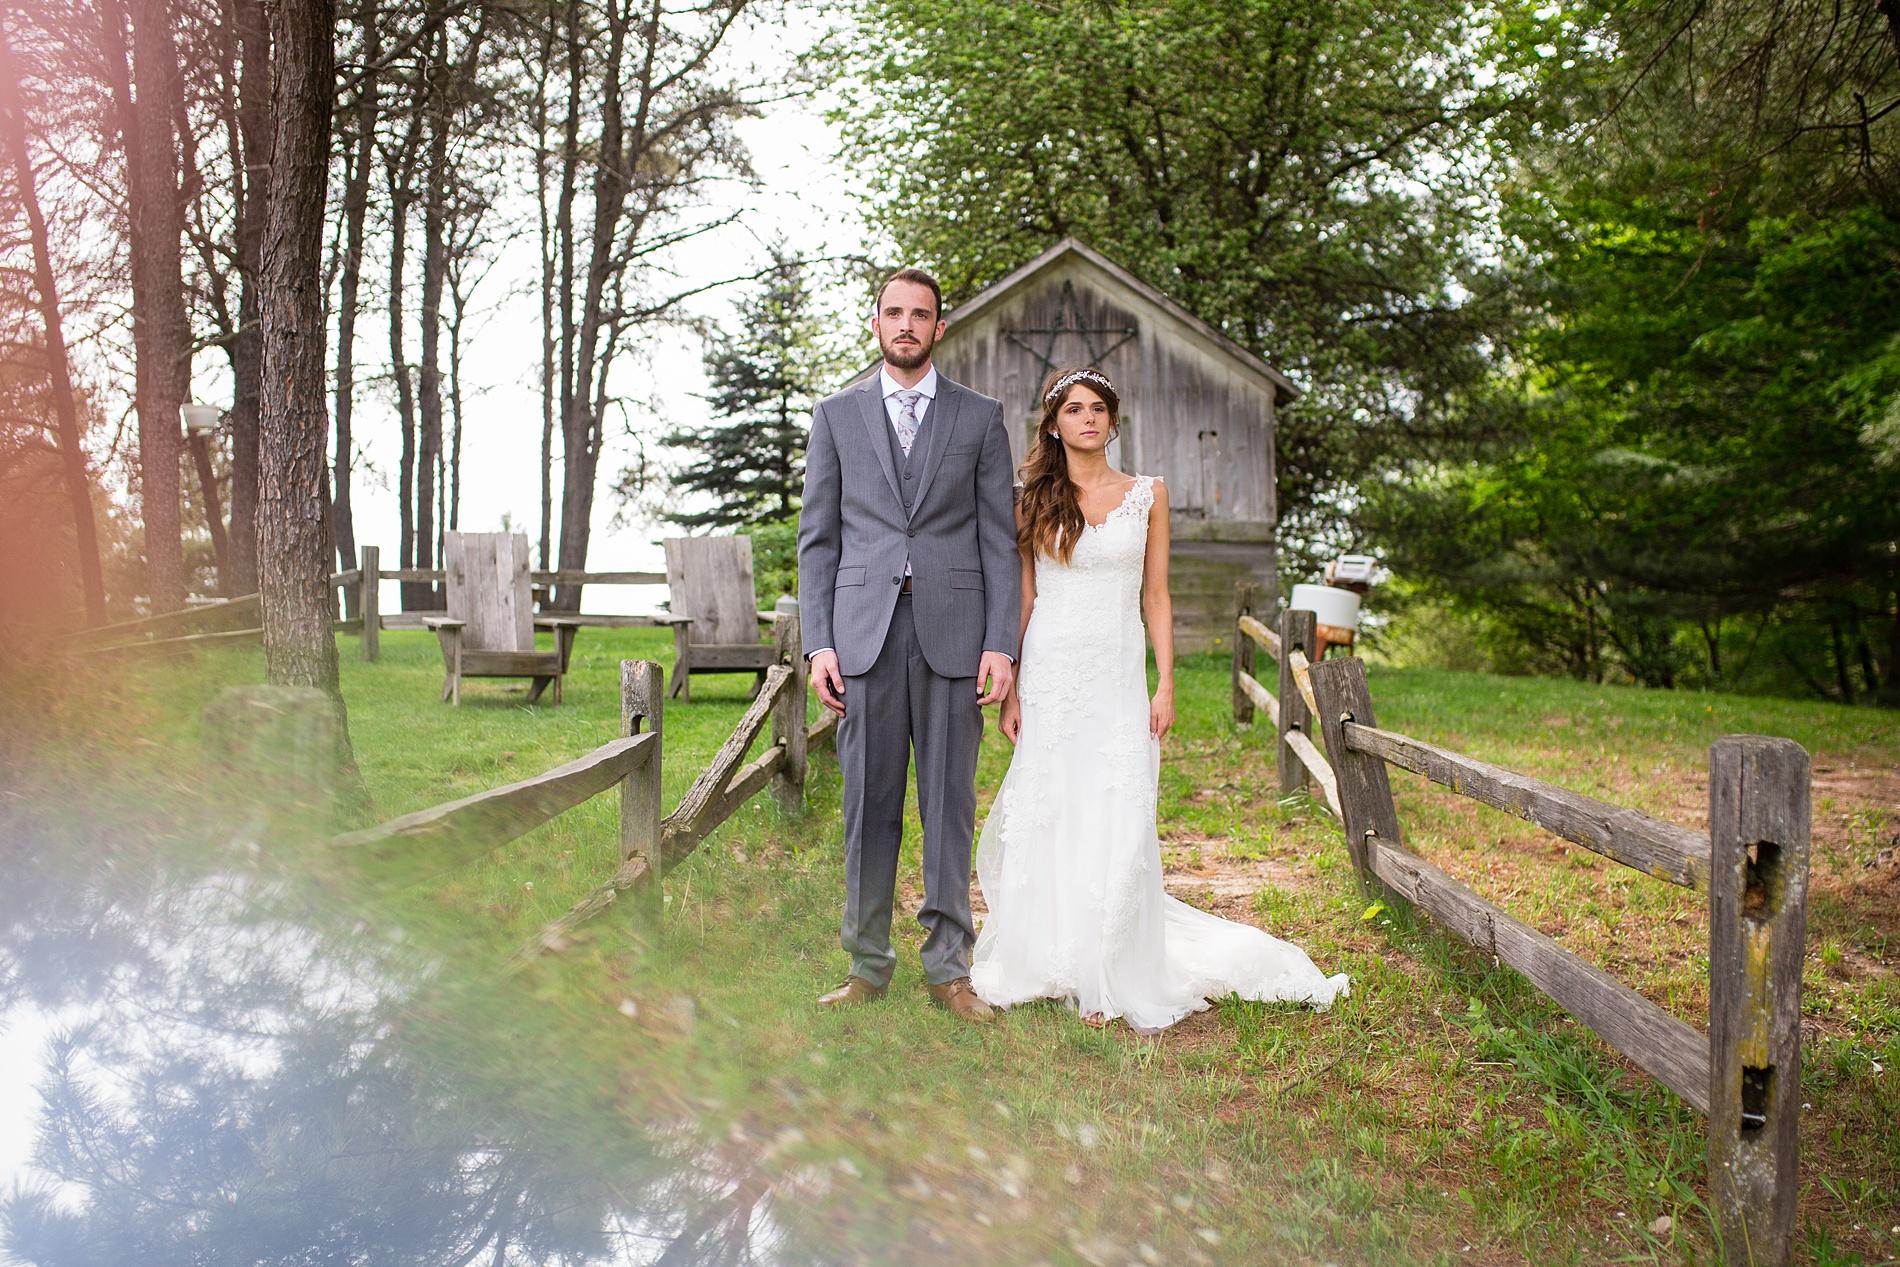 Brandon_Shafer_Photography_Brett_Autumn_Wedding_0034.jpg